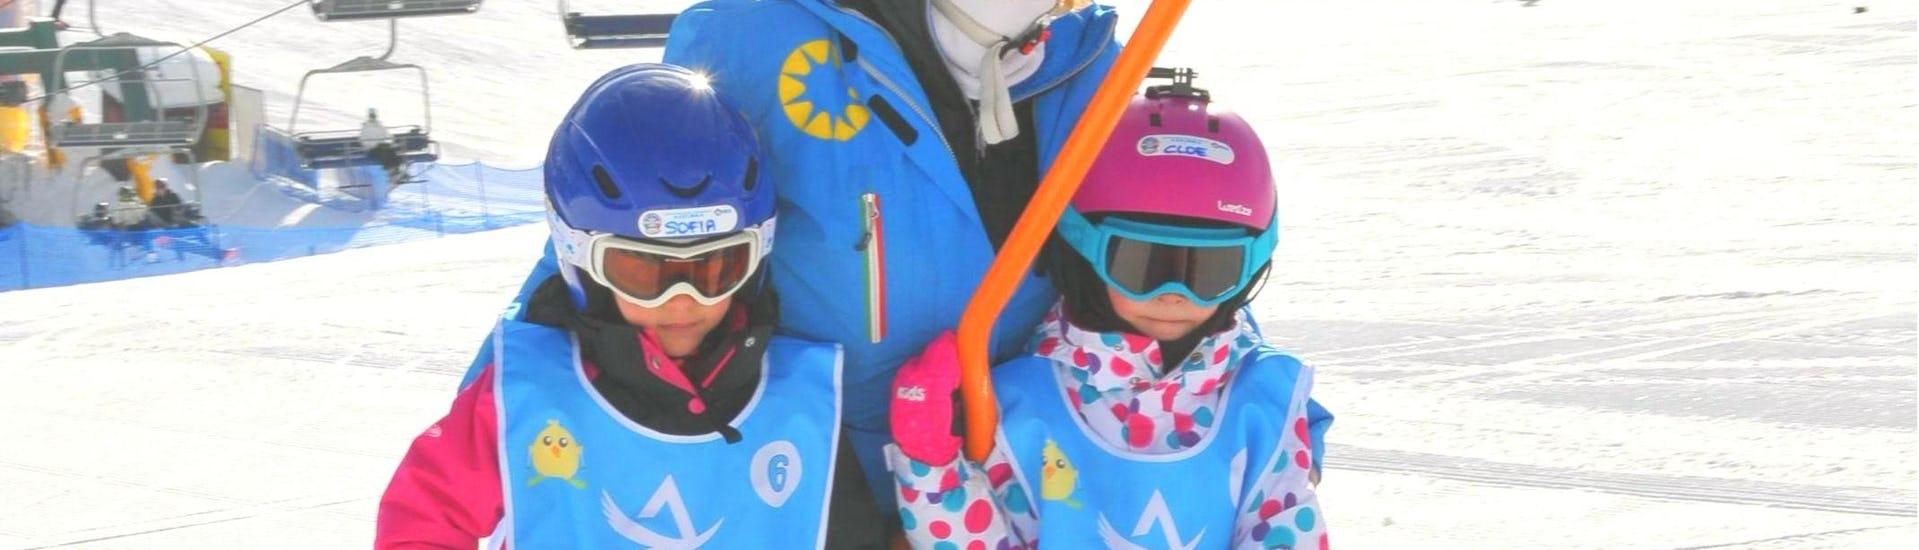 A ski instructor shows the use of the ski lift to two children during the  Private Ski Lessons for Kids - All Levels of the ski school Scuola di Sci Azzurra Livigno.